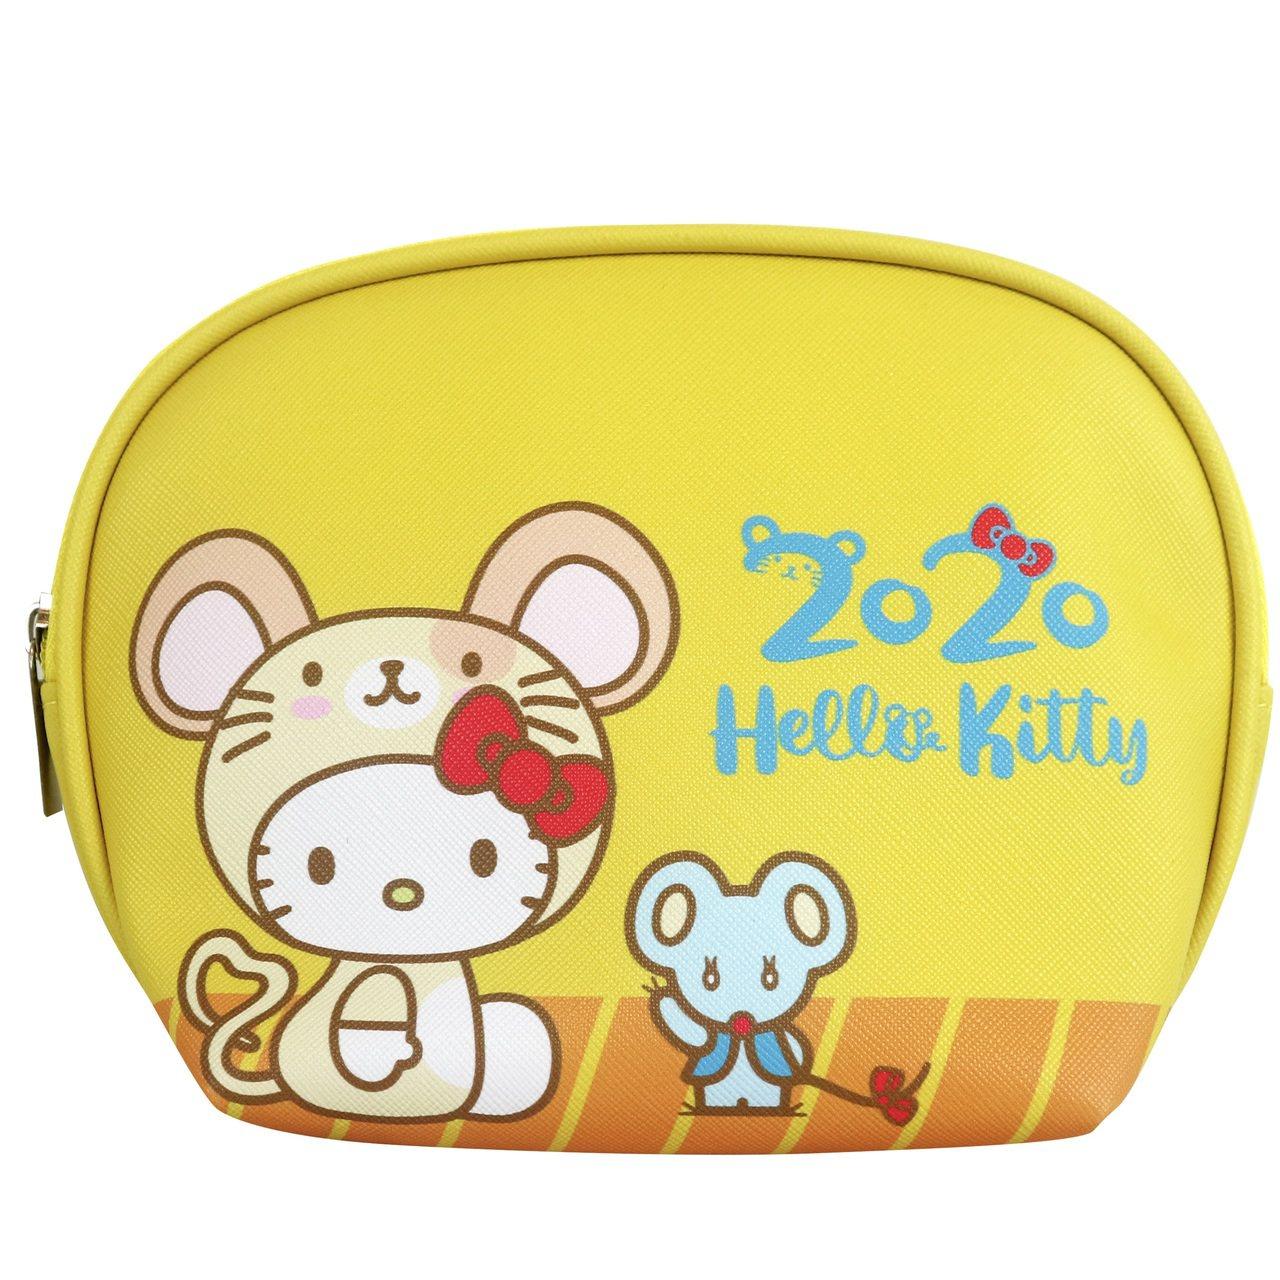 7-ELEVEN「Hello Kitty金鼠年限定萬用包」黃色款正面。圖/7-E...